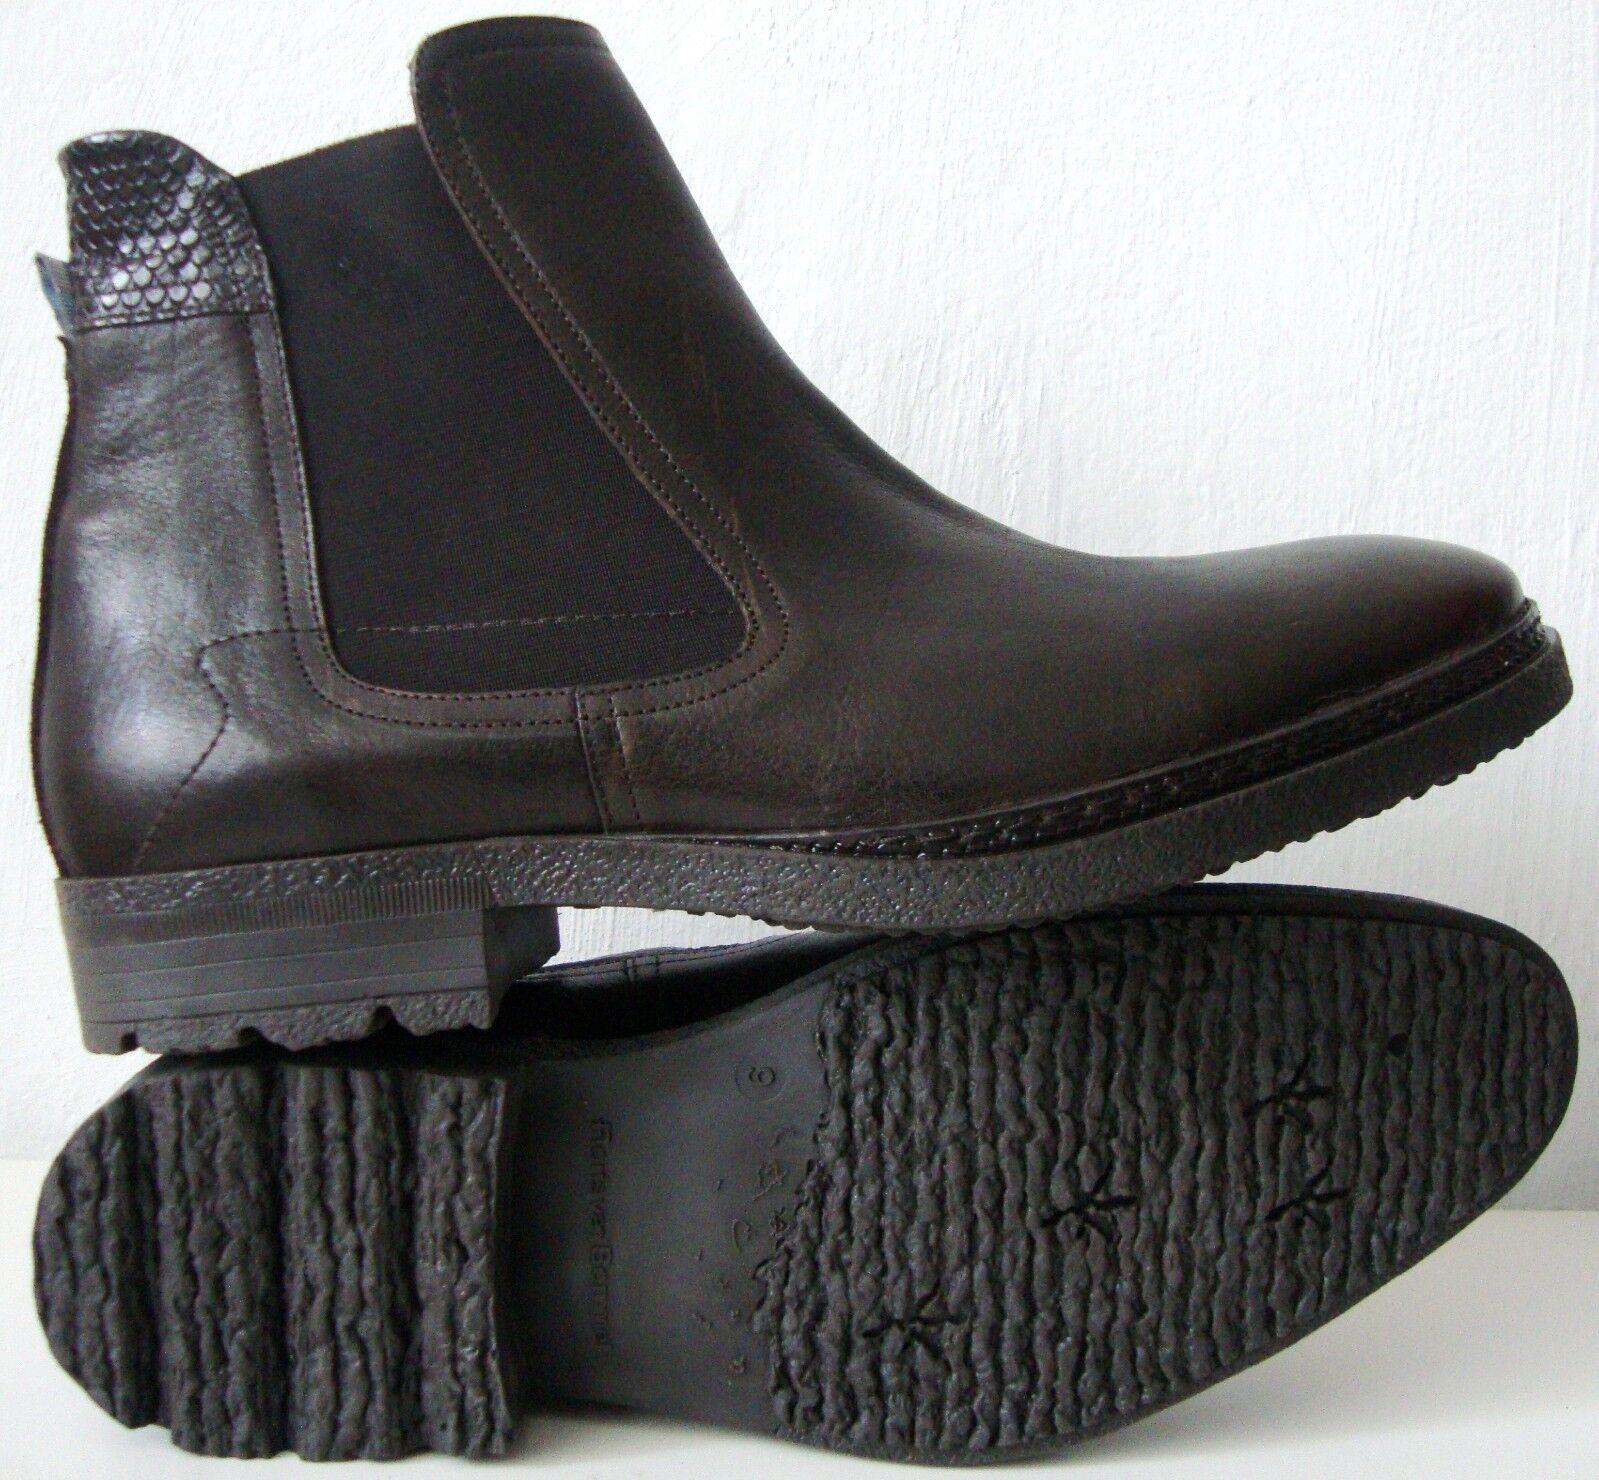 9a68703b9f3451 ... FLORIS VAN BOMMEL Schuhe Boots Herren Stiefel Stiefelette Schuhe BOMMEL  Halbschuhe Gr.43 NEU 87f5f8 ...